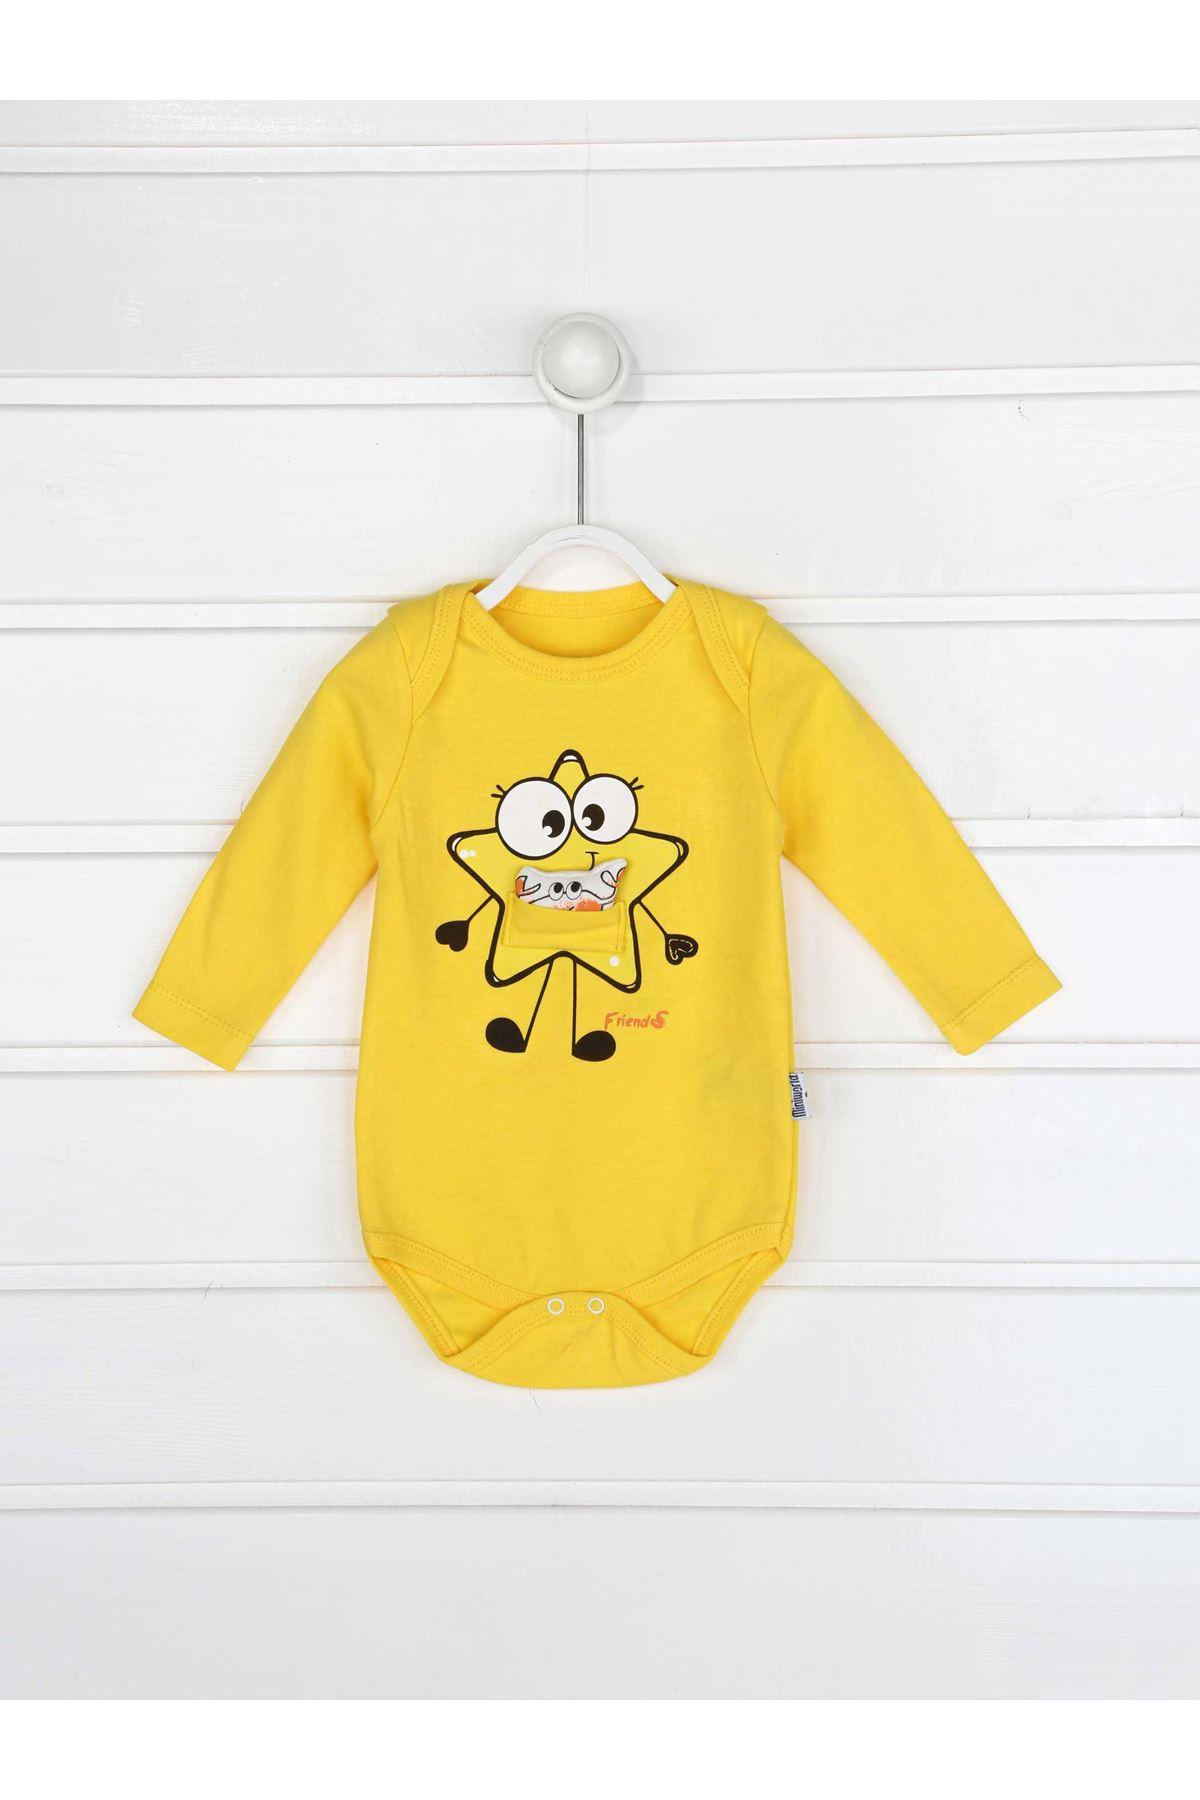 Yellow Baby Boy 3 Pcs Set